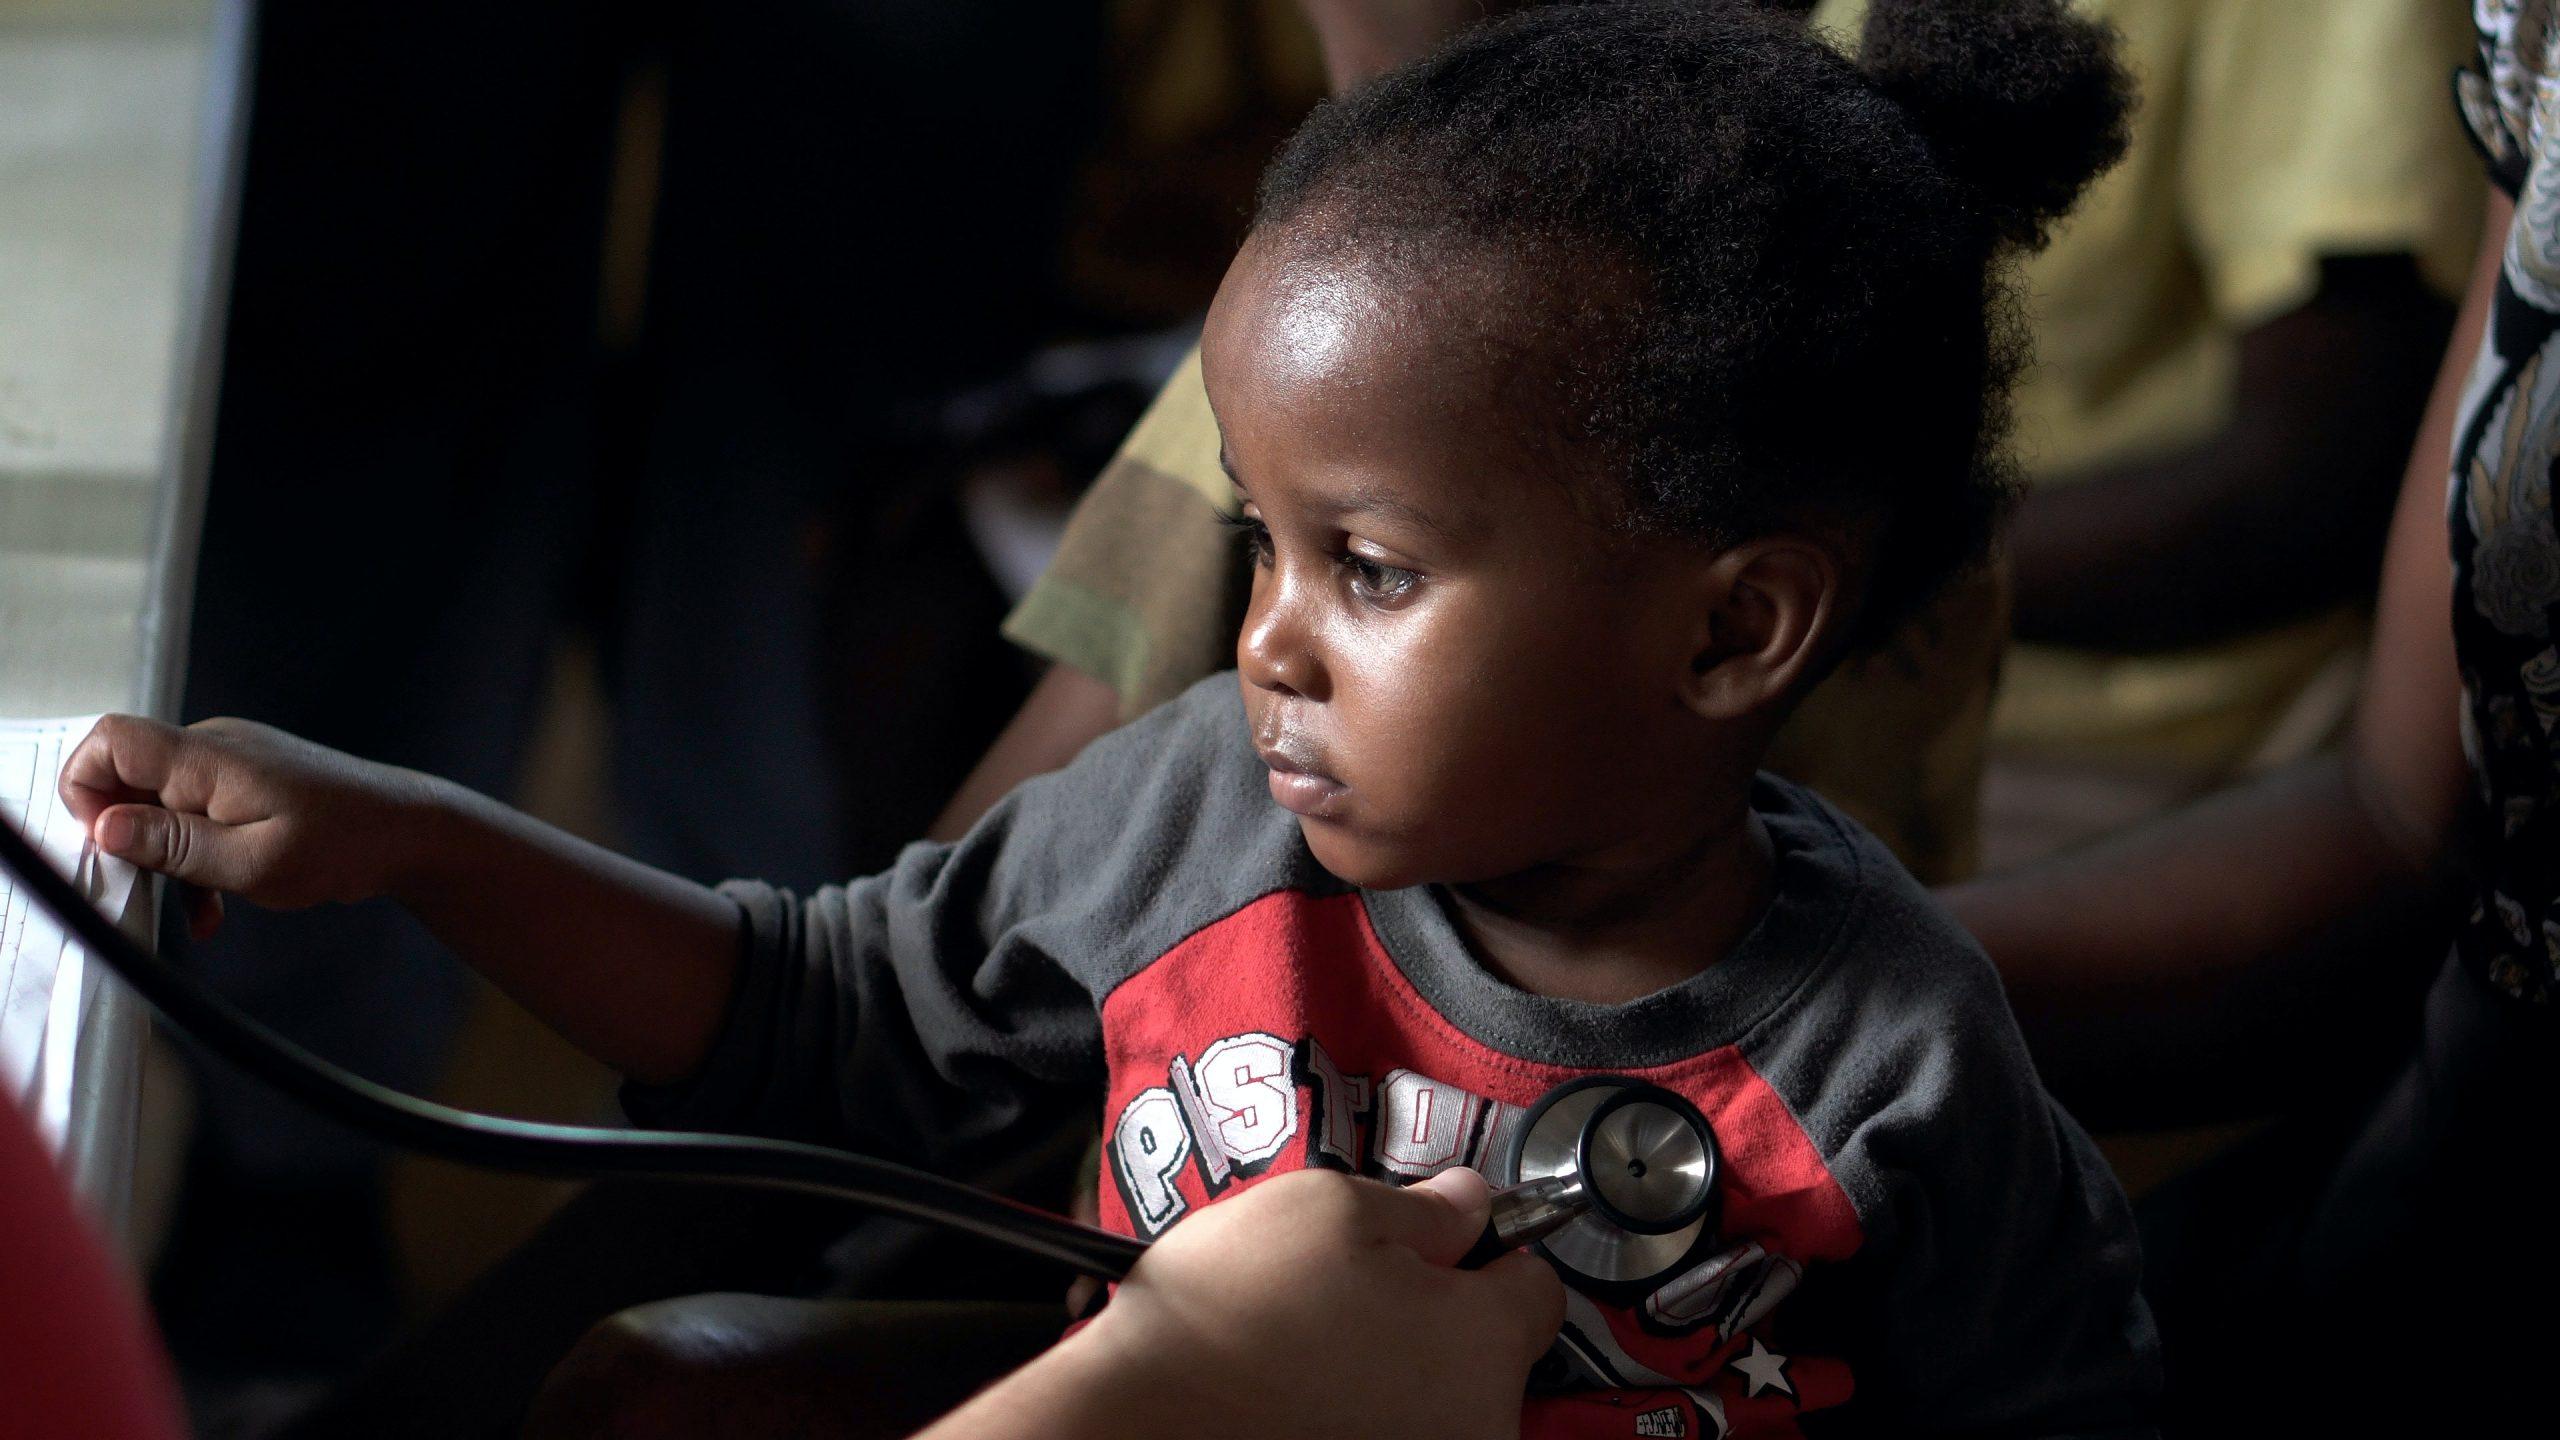 ebola, coronavirus, child